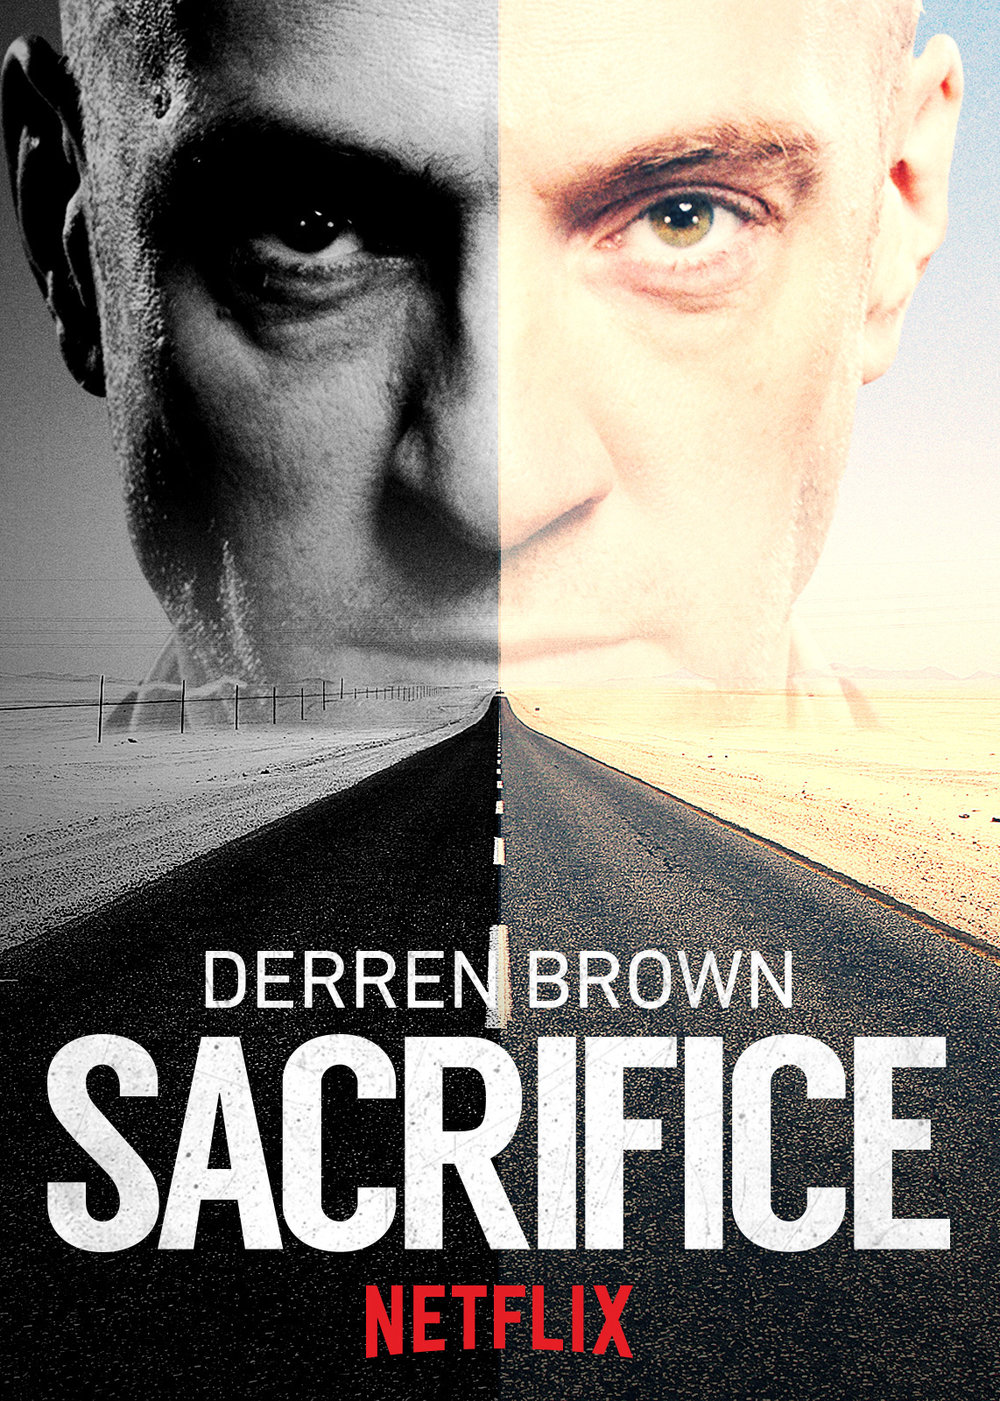 DerrenBrown_Sacrifice.jpg